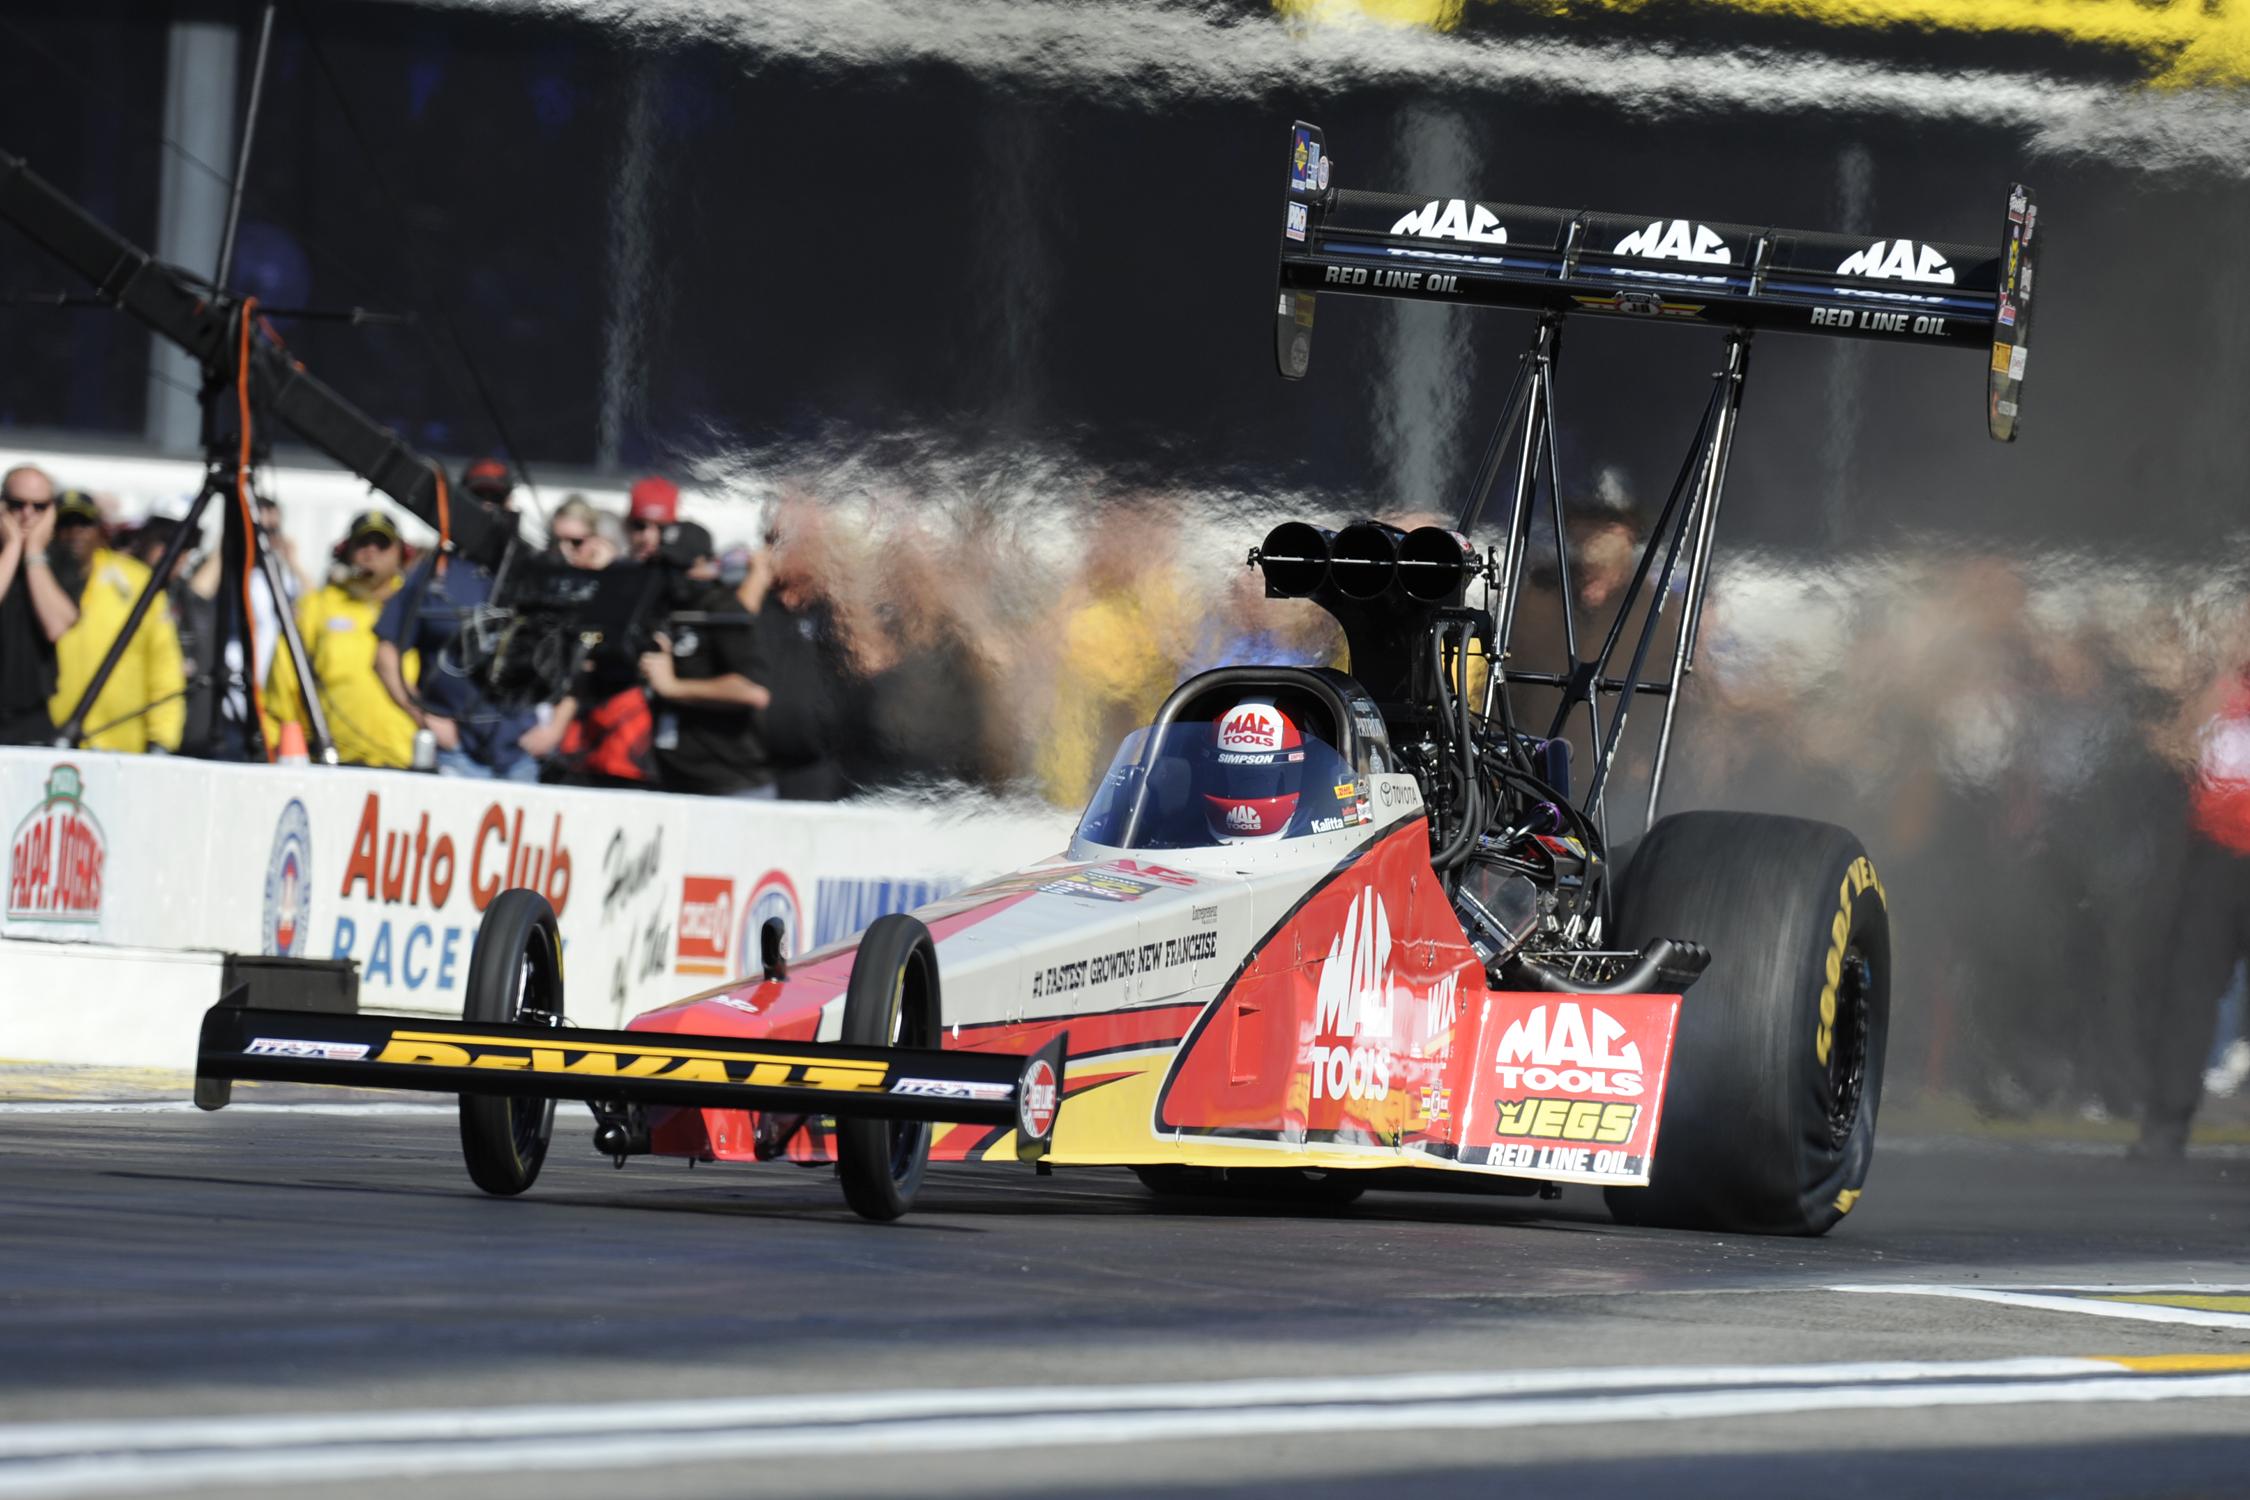 NHRA Top Fuel Doug Kalitta action